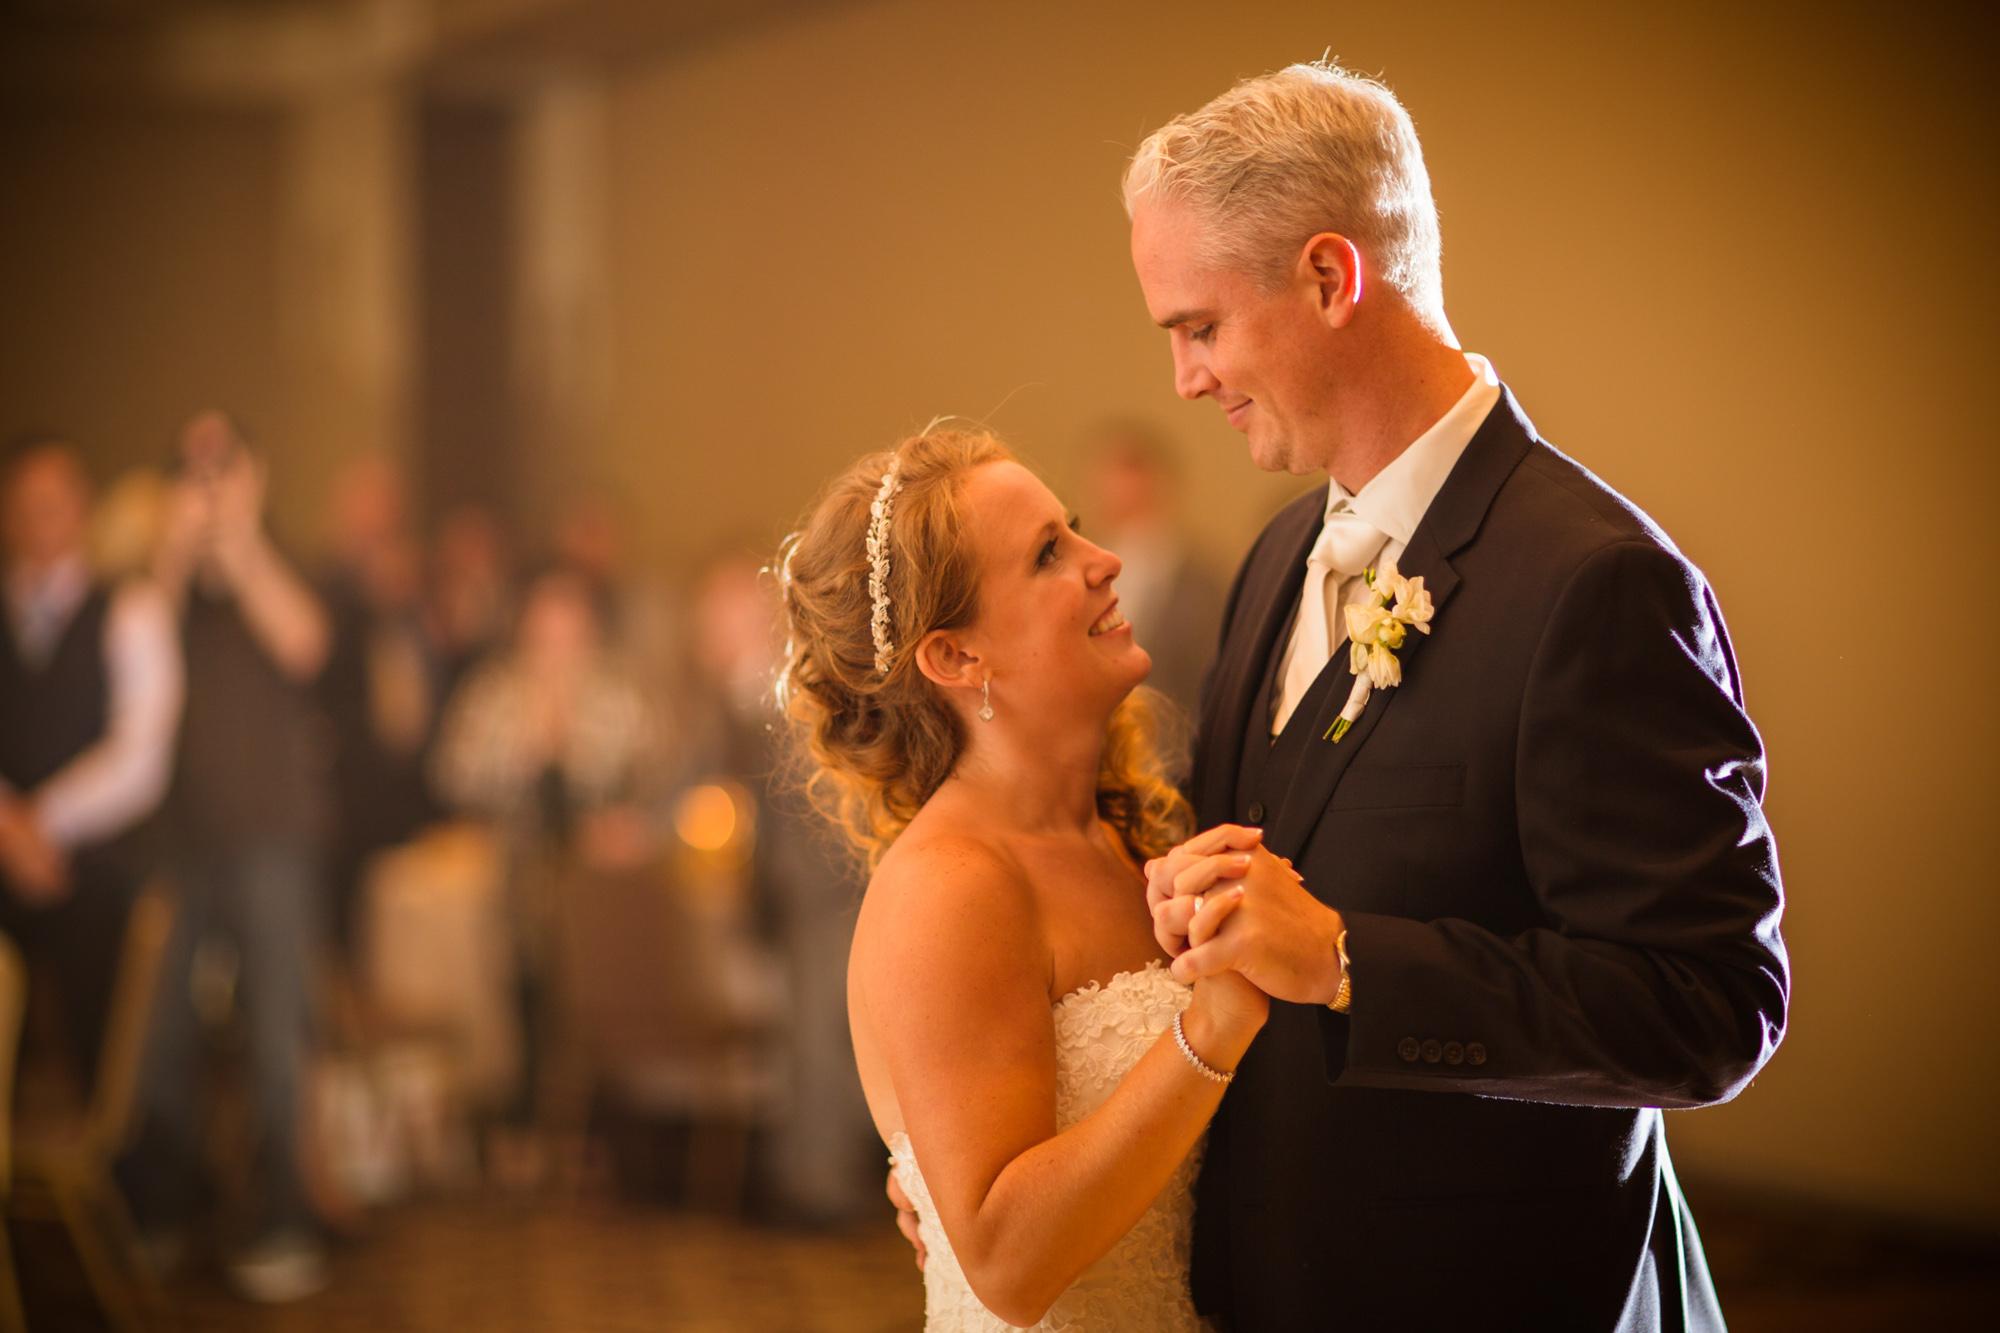 scranton_wedding_photographer_lettieri_pa (38 of 47).jpg